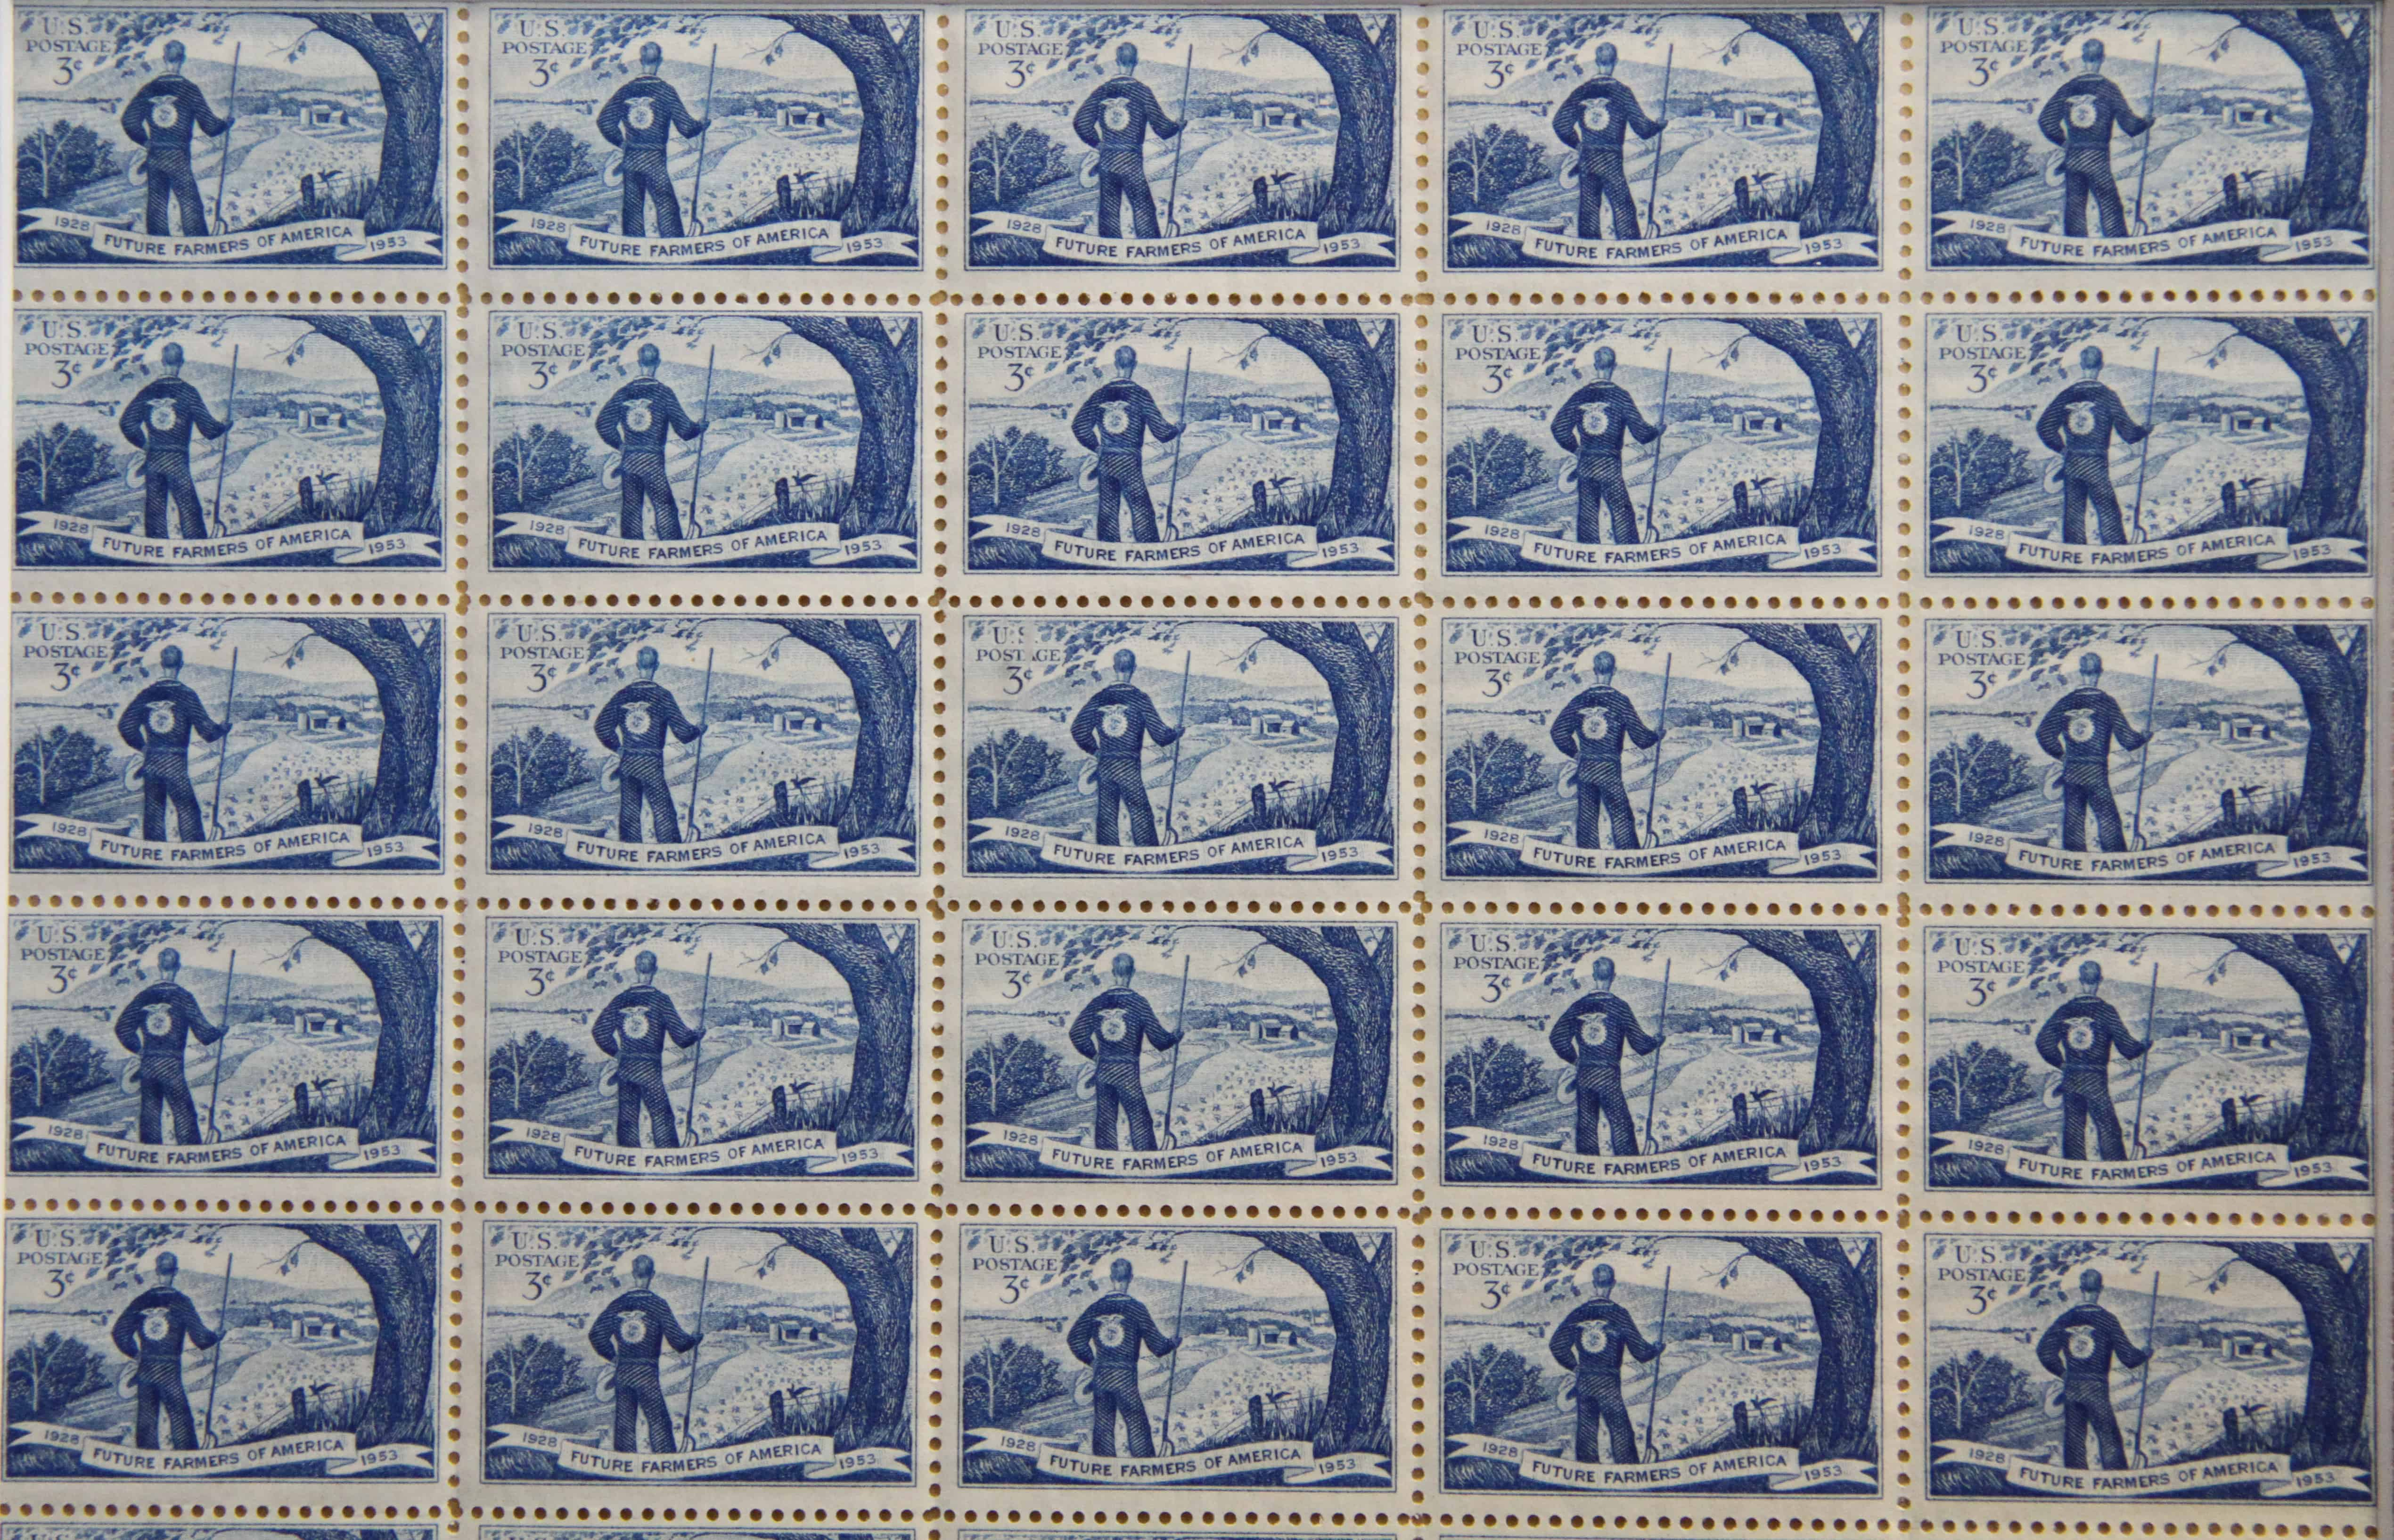 FFA Postage Stamp - 1953